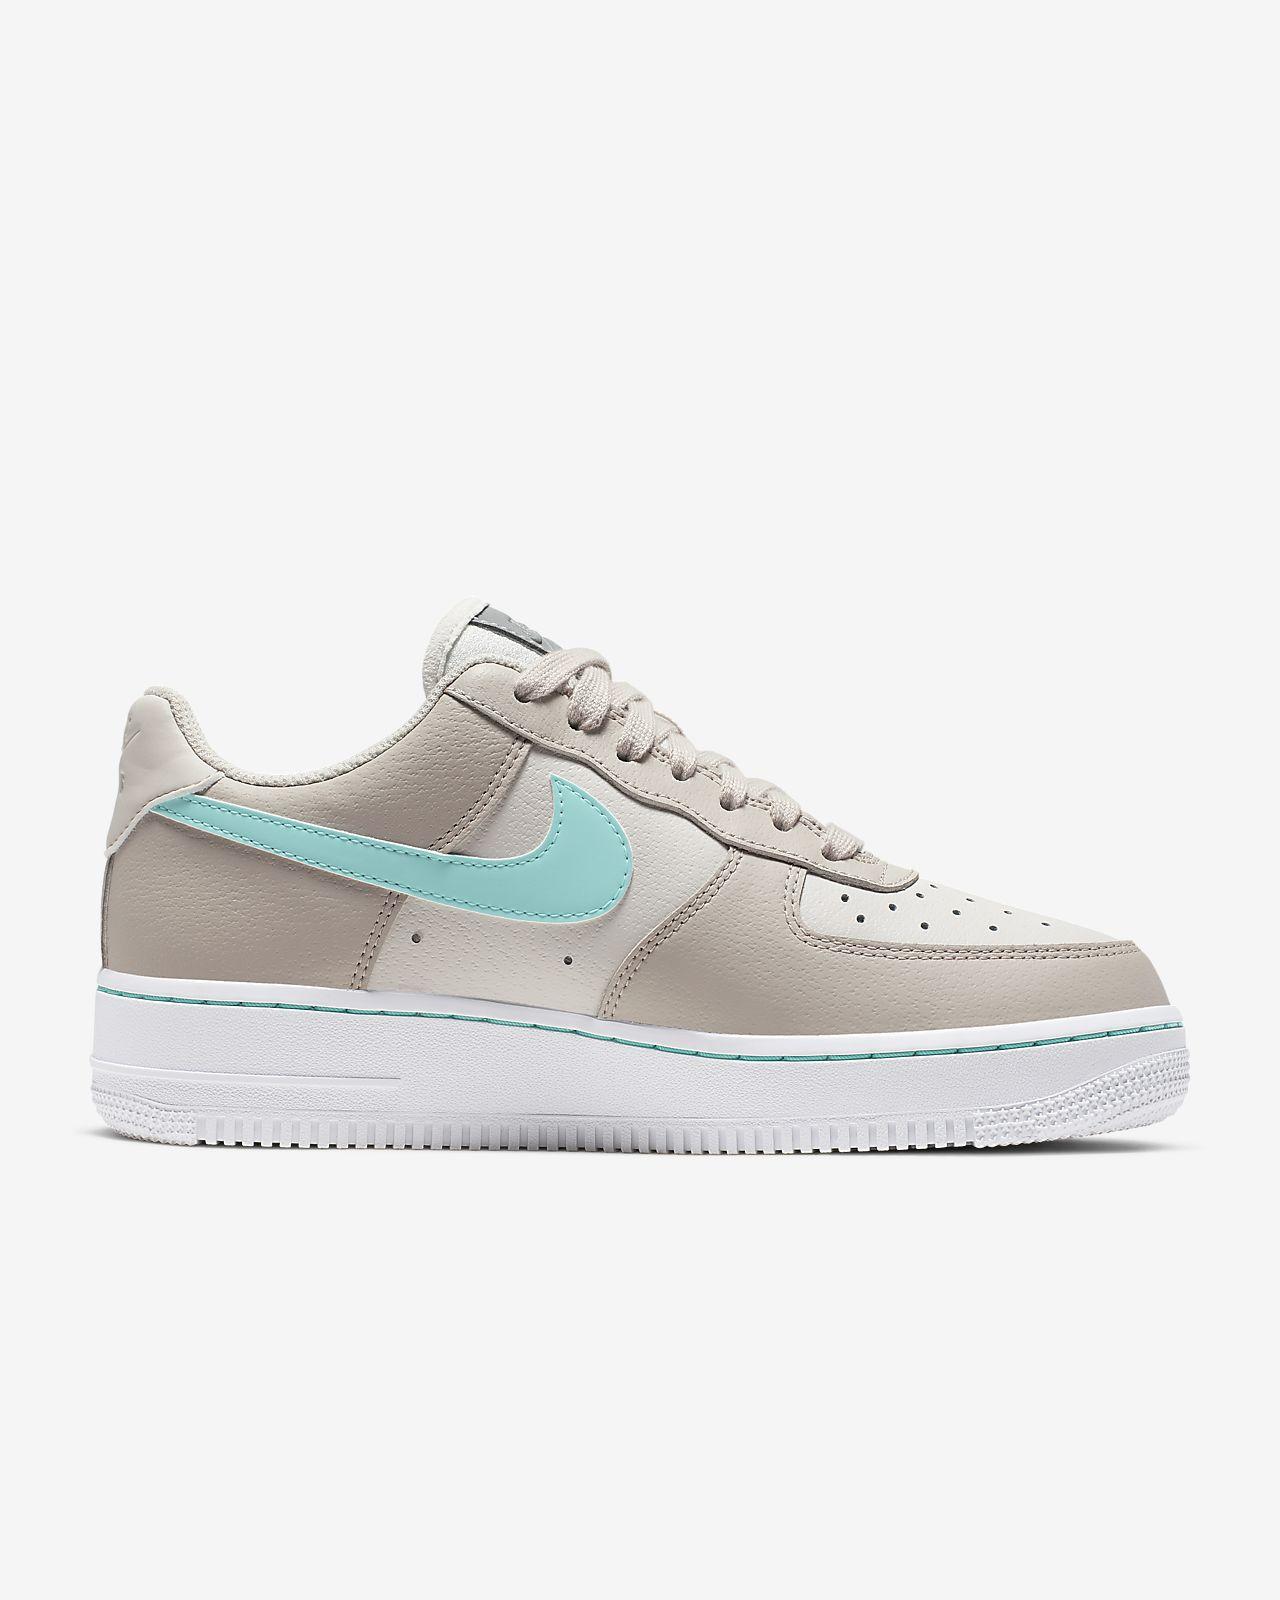 quality cozy fresh united states Nike Air Force 1 Low Damenschuh